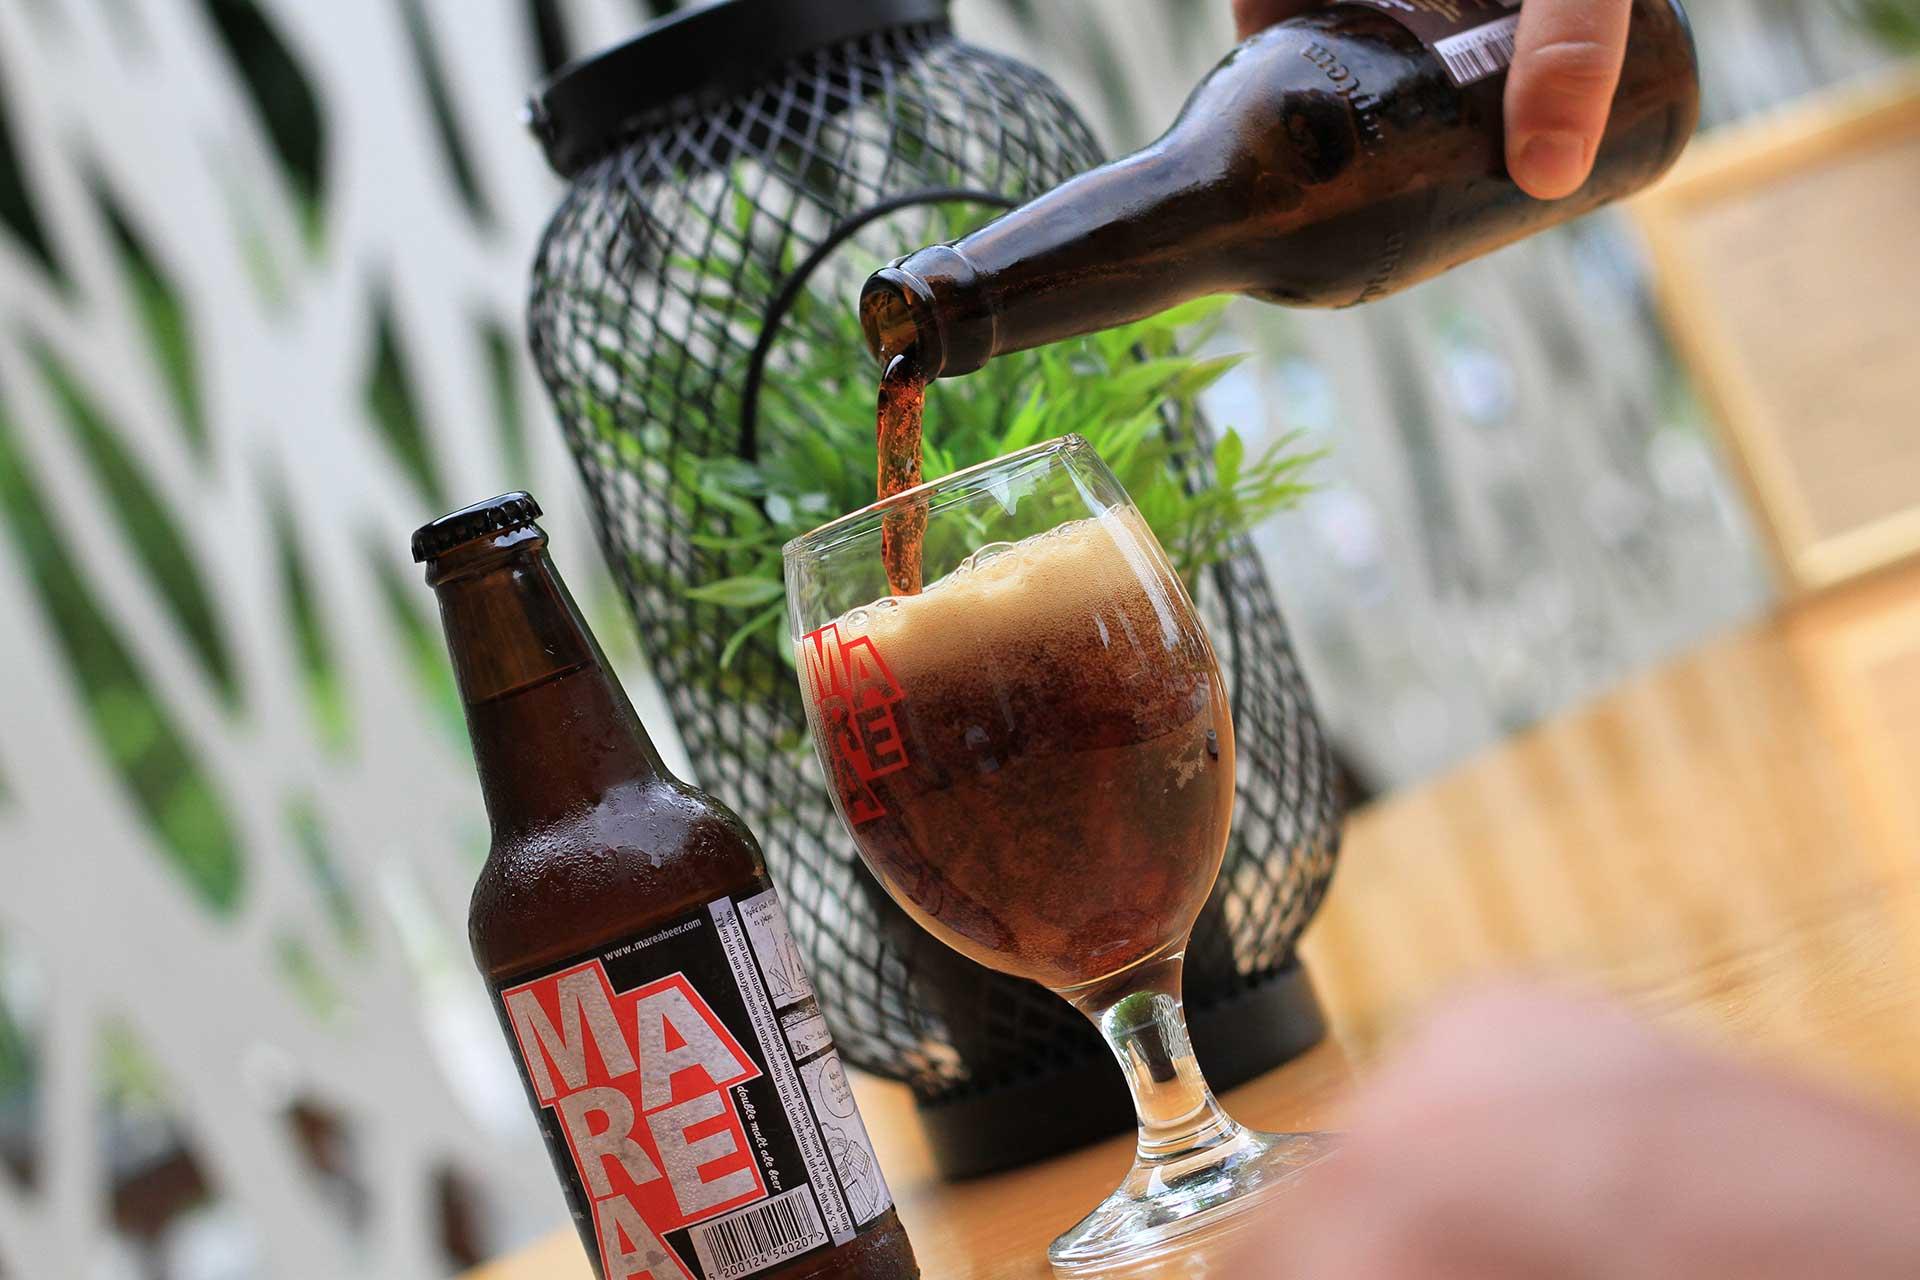 island - enjoy Marea beer on Pefki, Artemisio, North Evia, Greece